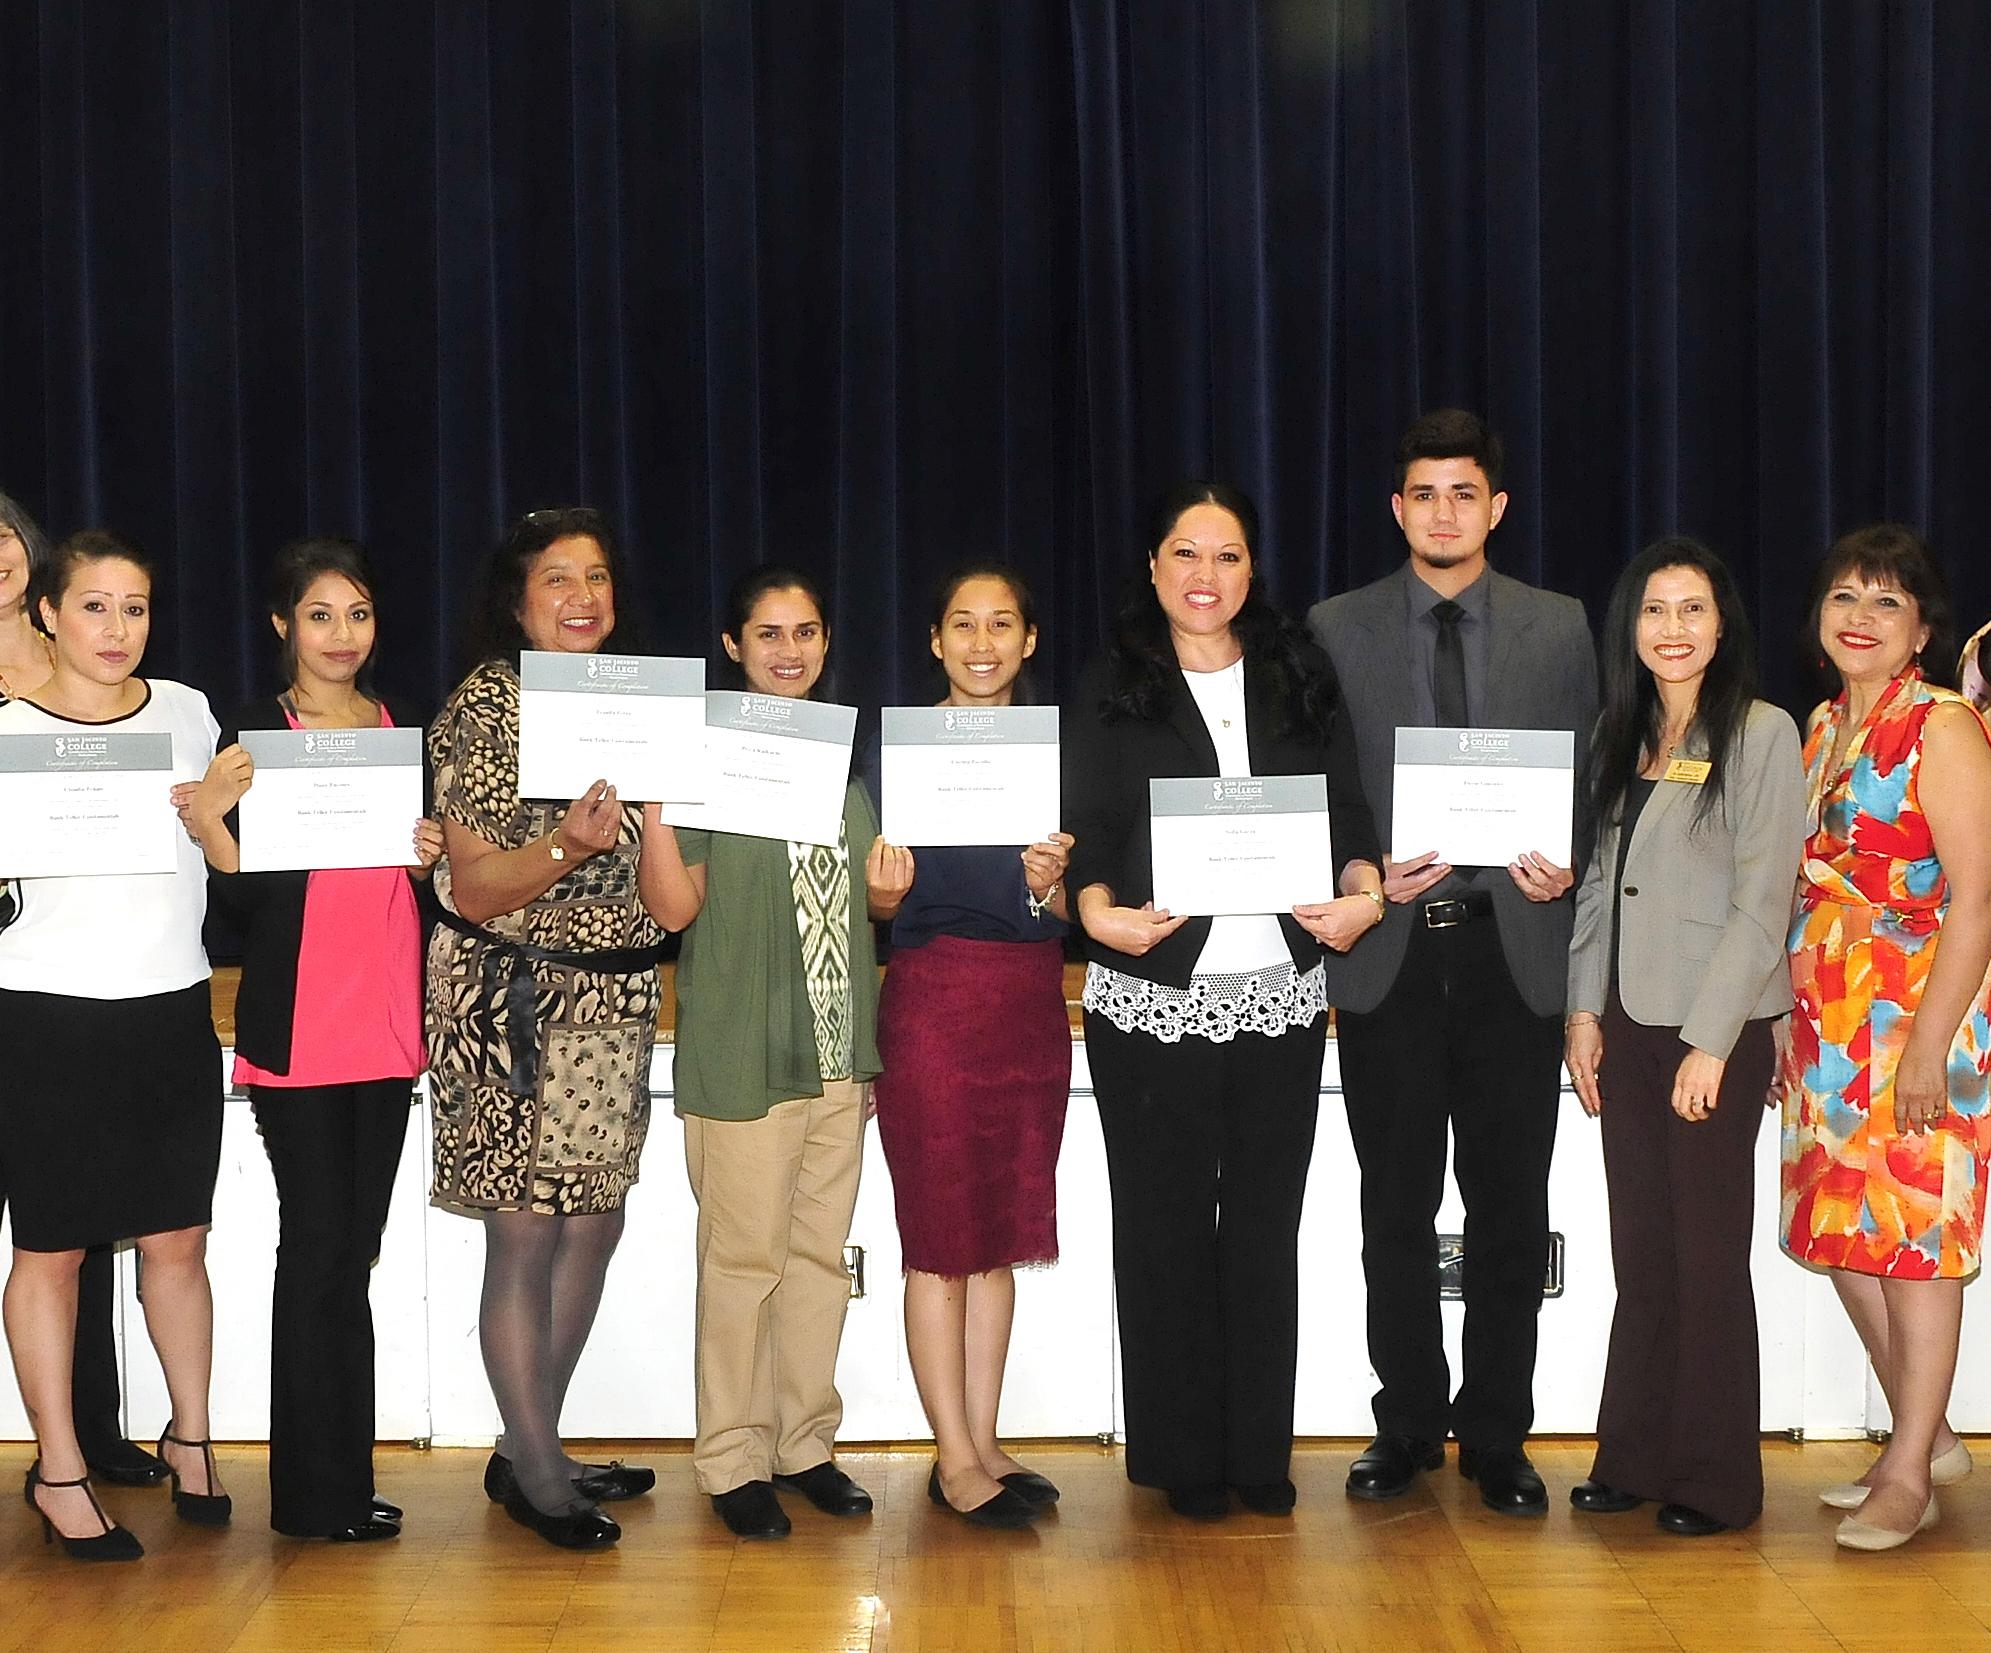 Pasadena residents pick up bank teller certificates to compete in job market